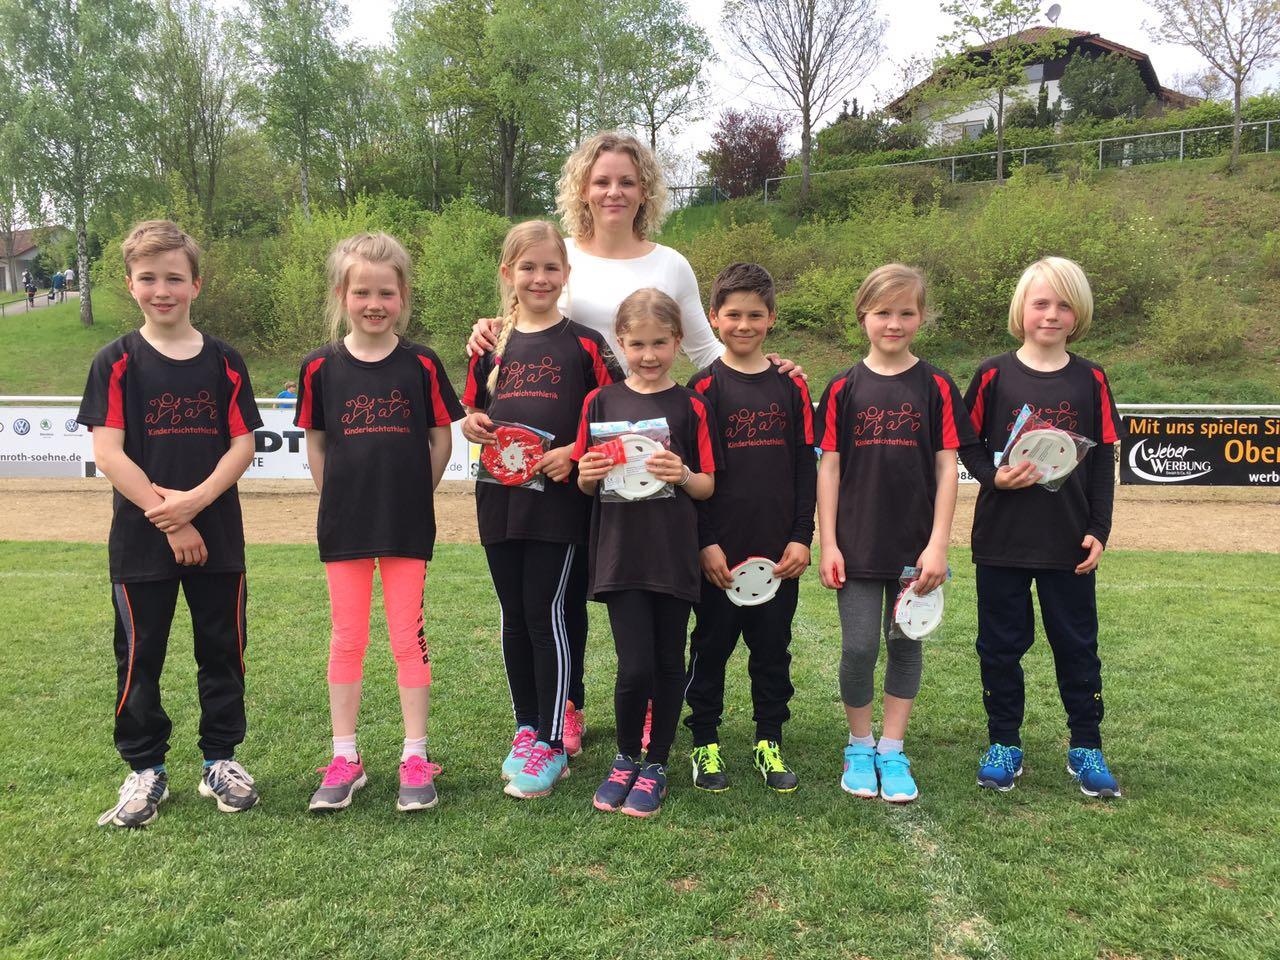 Team Kinderleichtathletik